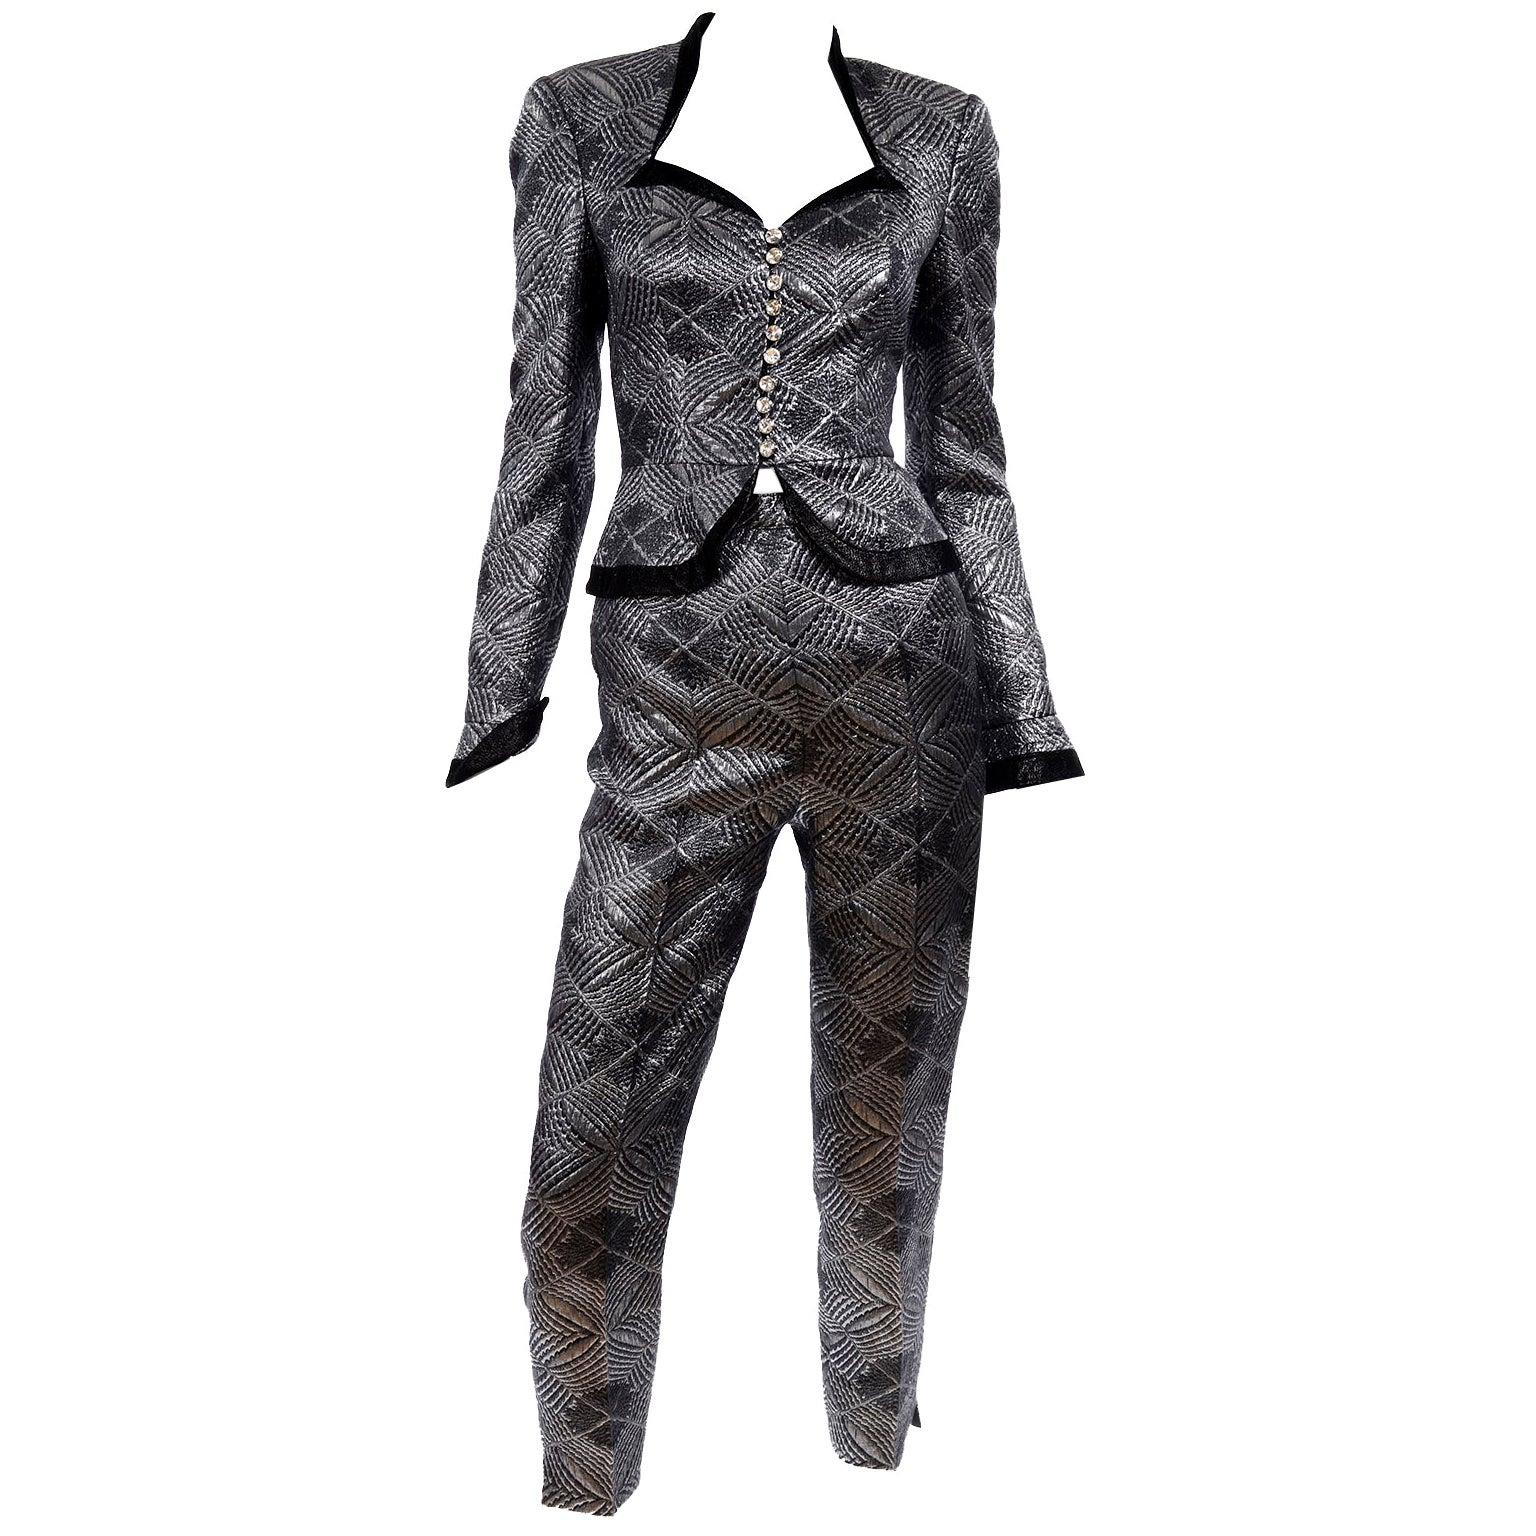 1990s Vintage Escada Couture 3pc Silver Lurex Evening Skirt Pants & Jacket